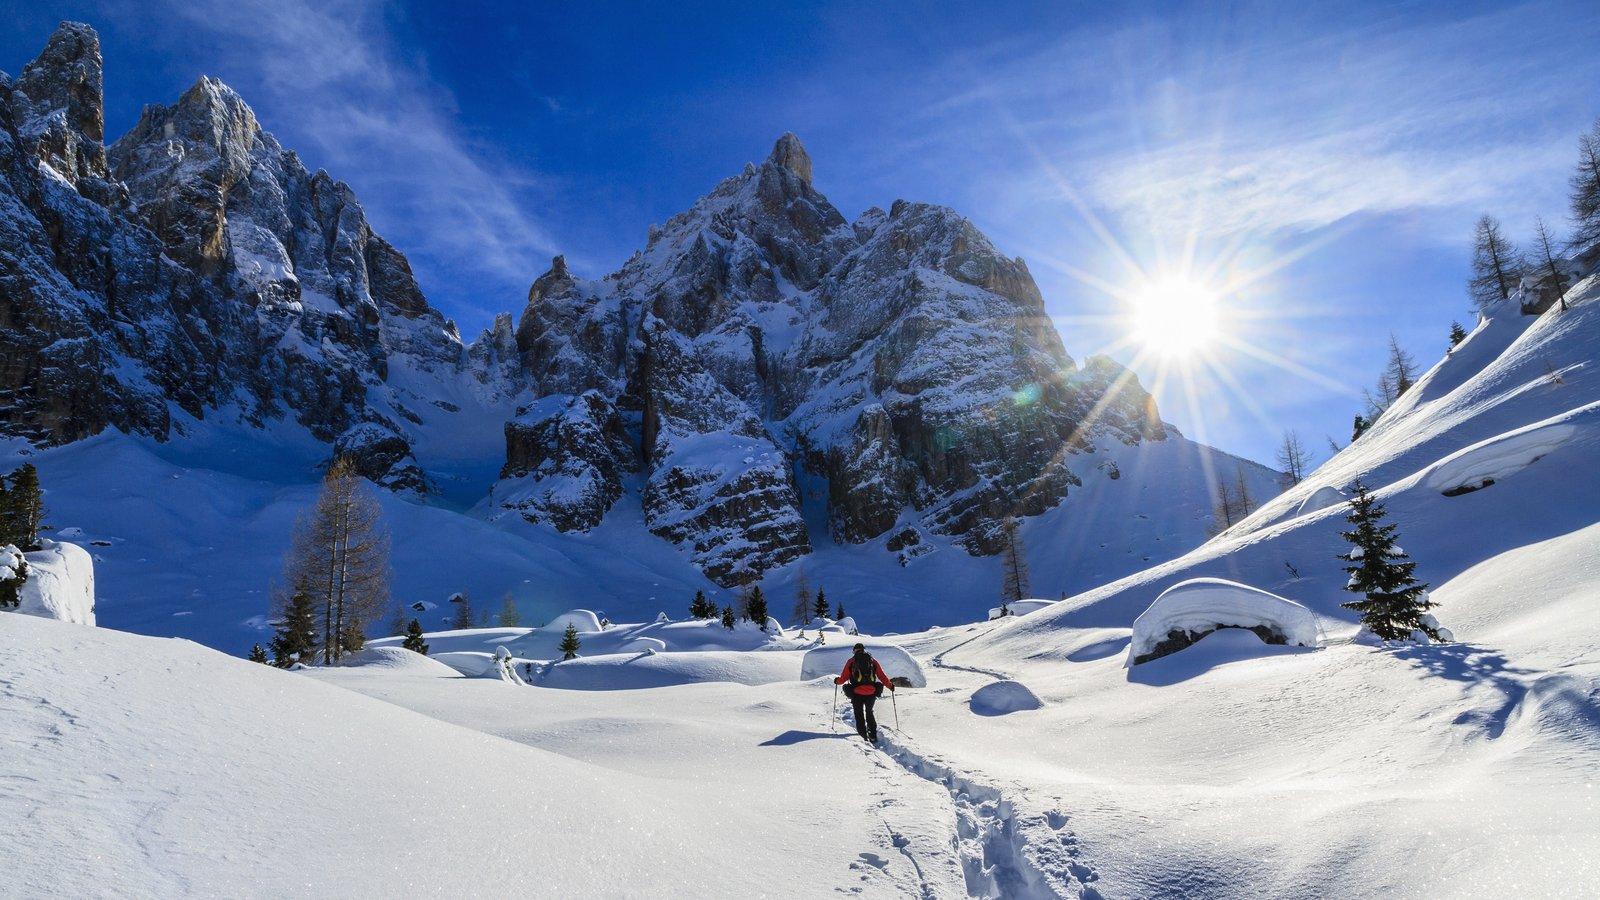 Trentino caracterizando neve, montanhas e snowshoe